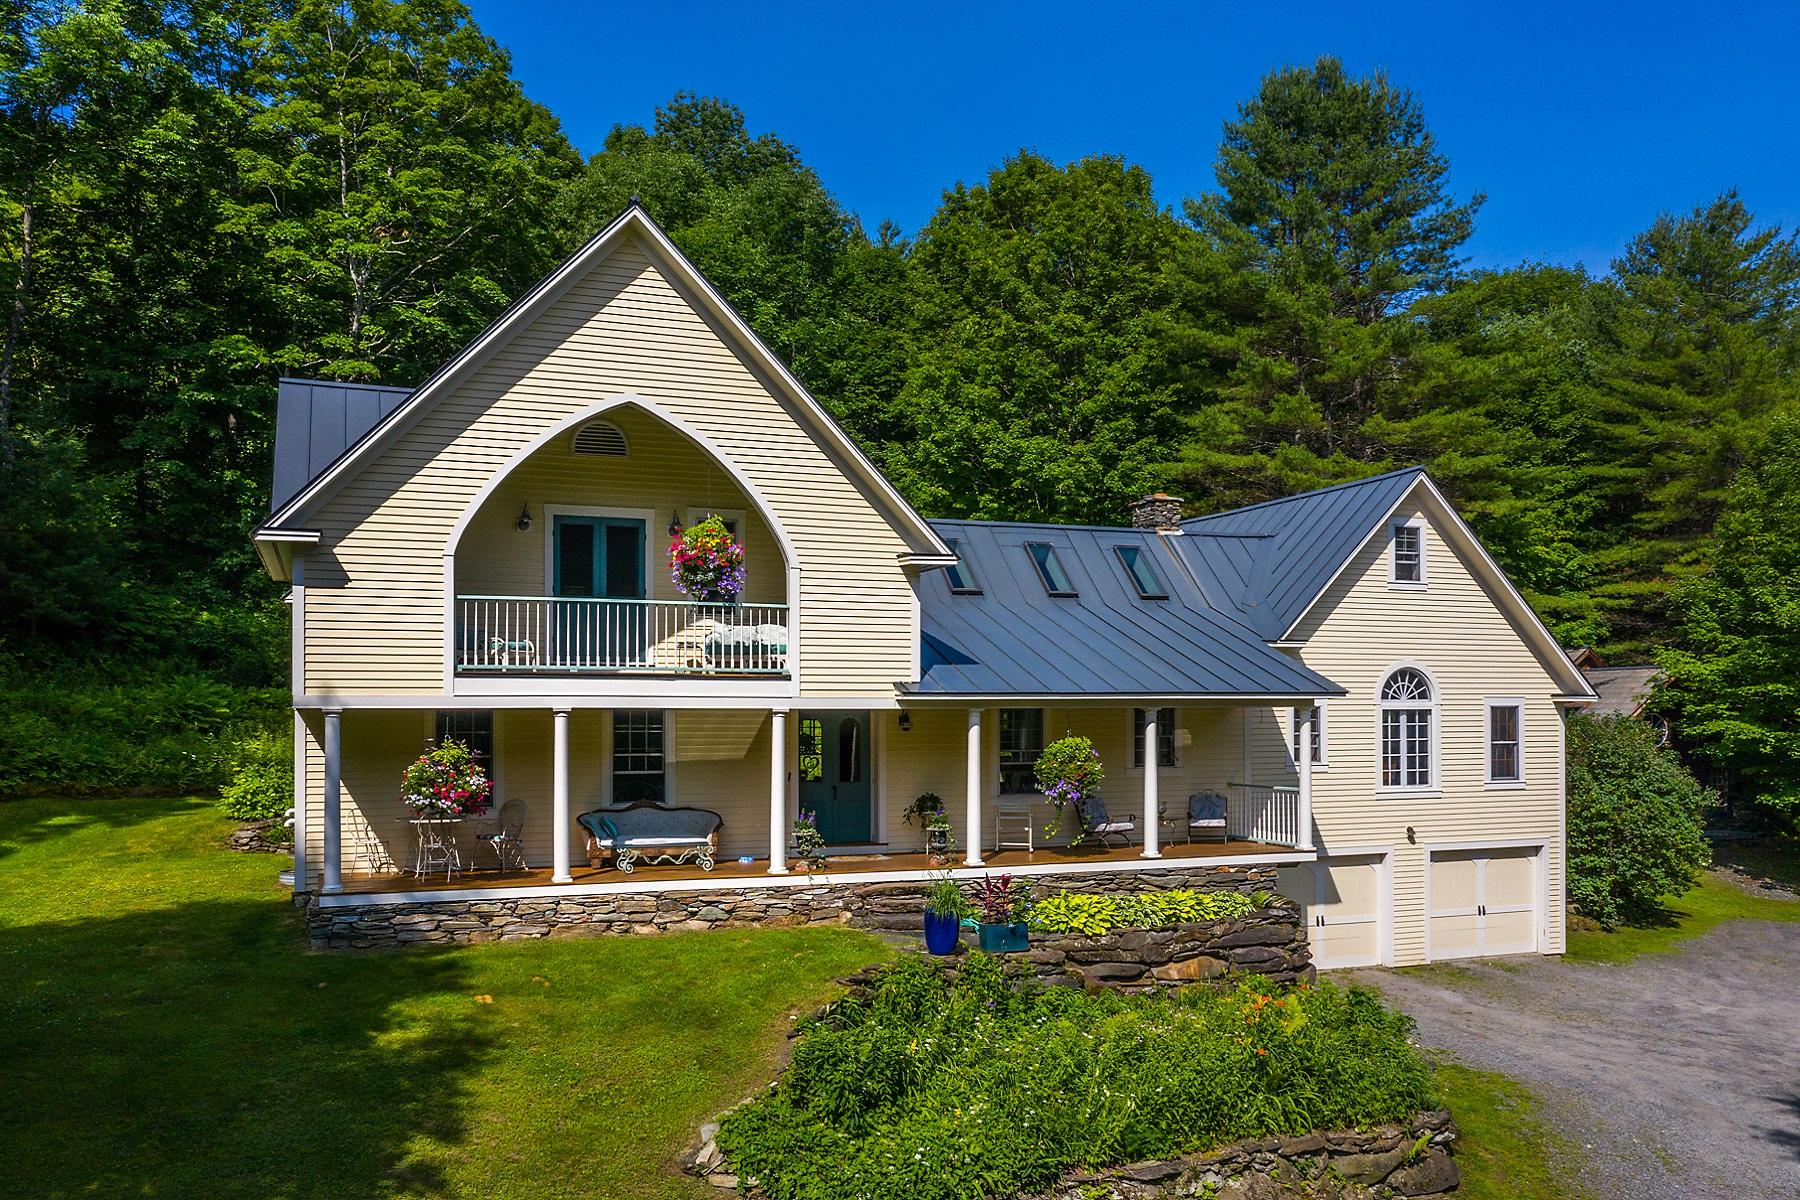 Single Family Homes for Sale at Custom Home on 48 Acres + Pond 1799 Pomfret Road South Pomfret, Vermont 05067 United States